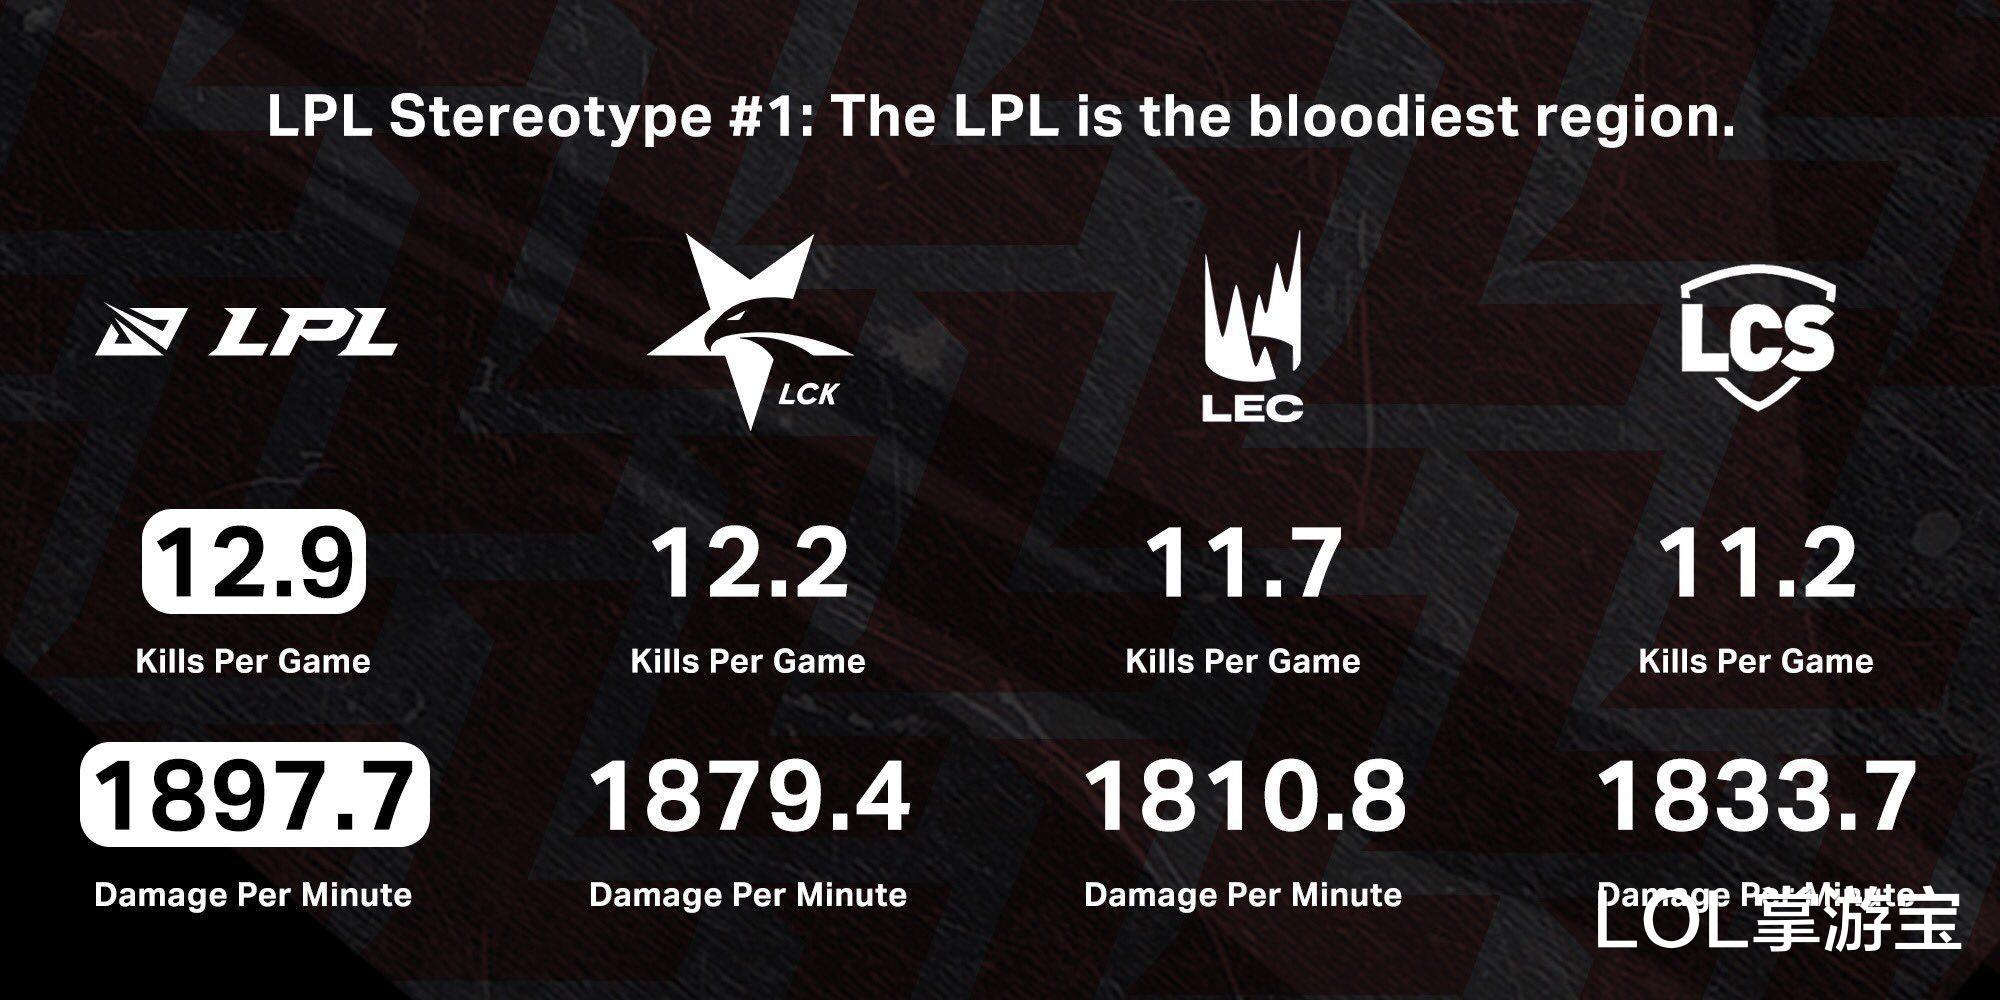 LOL 血腥程度排行:LPL四大賽區第一,TES全球主要賽區中位列第二-圖3